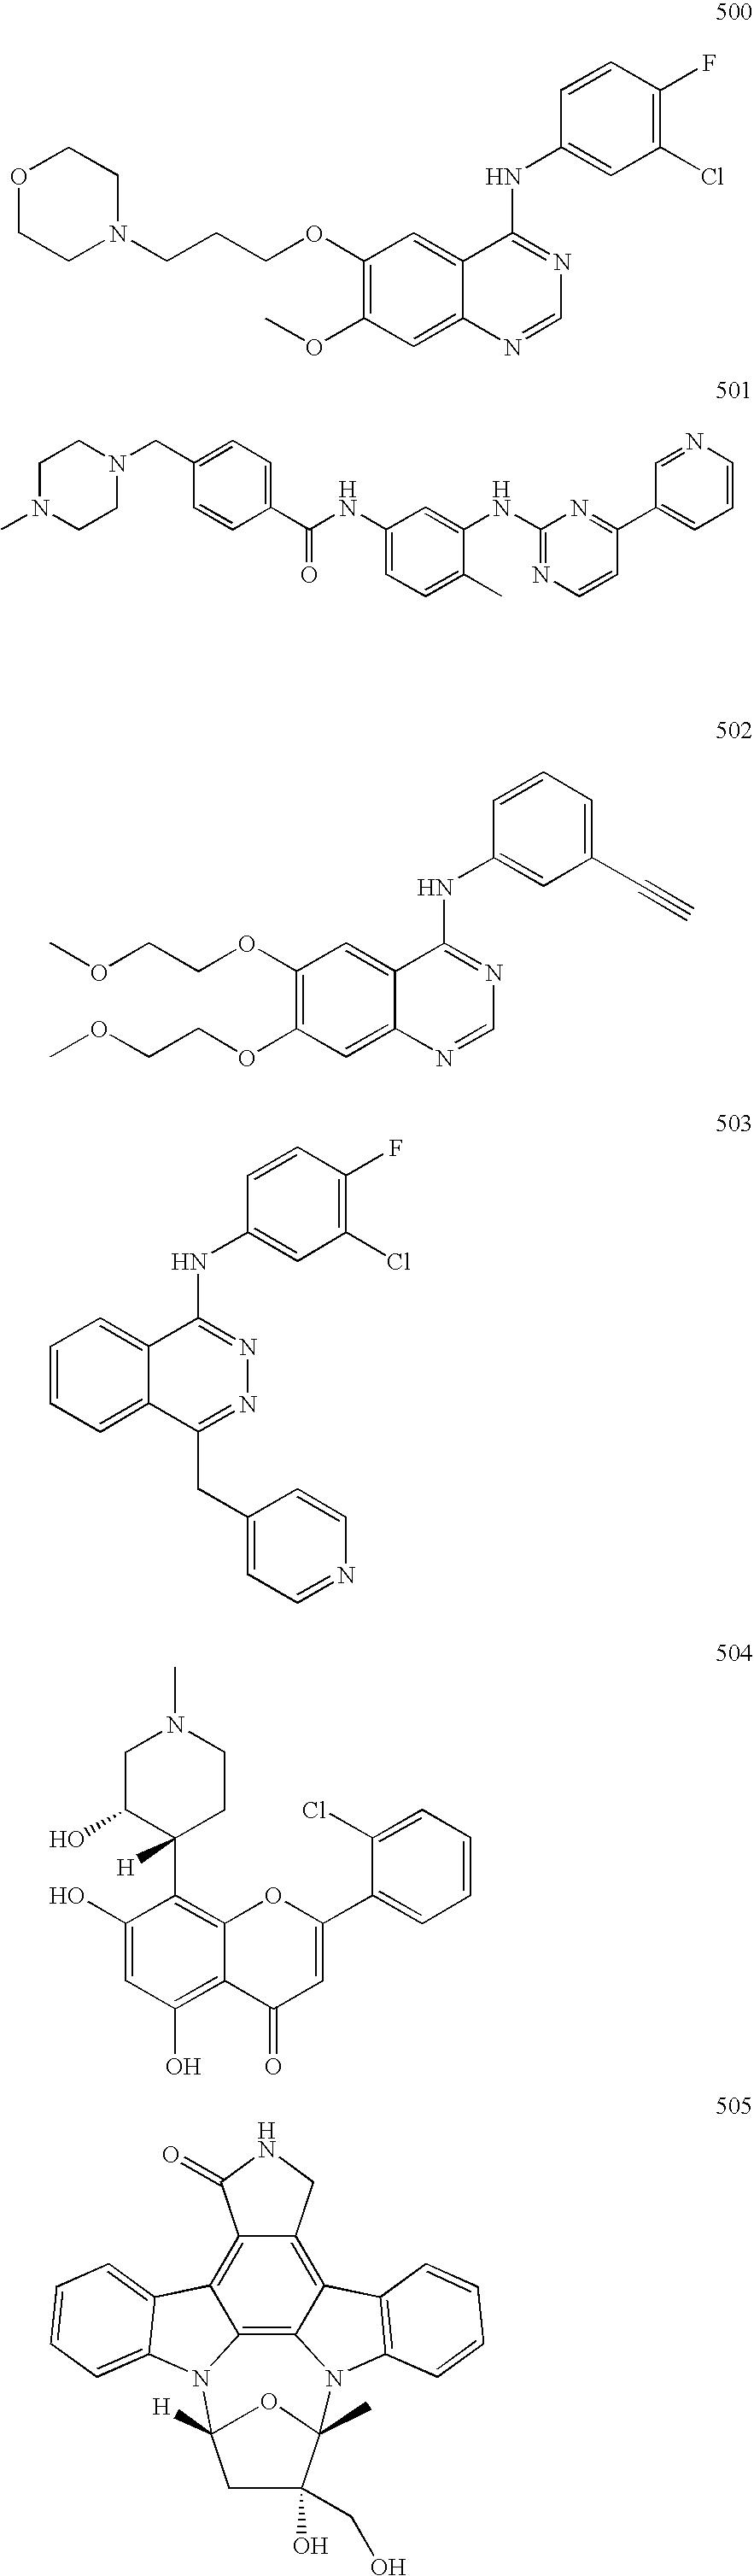 Us20050153990a1 Phosphonate Substituted Kinase Inhibitors Google Wiring Diagram 1477 Bolens Figure 20050714 C00085